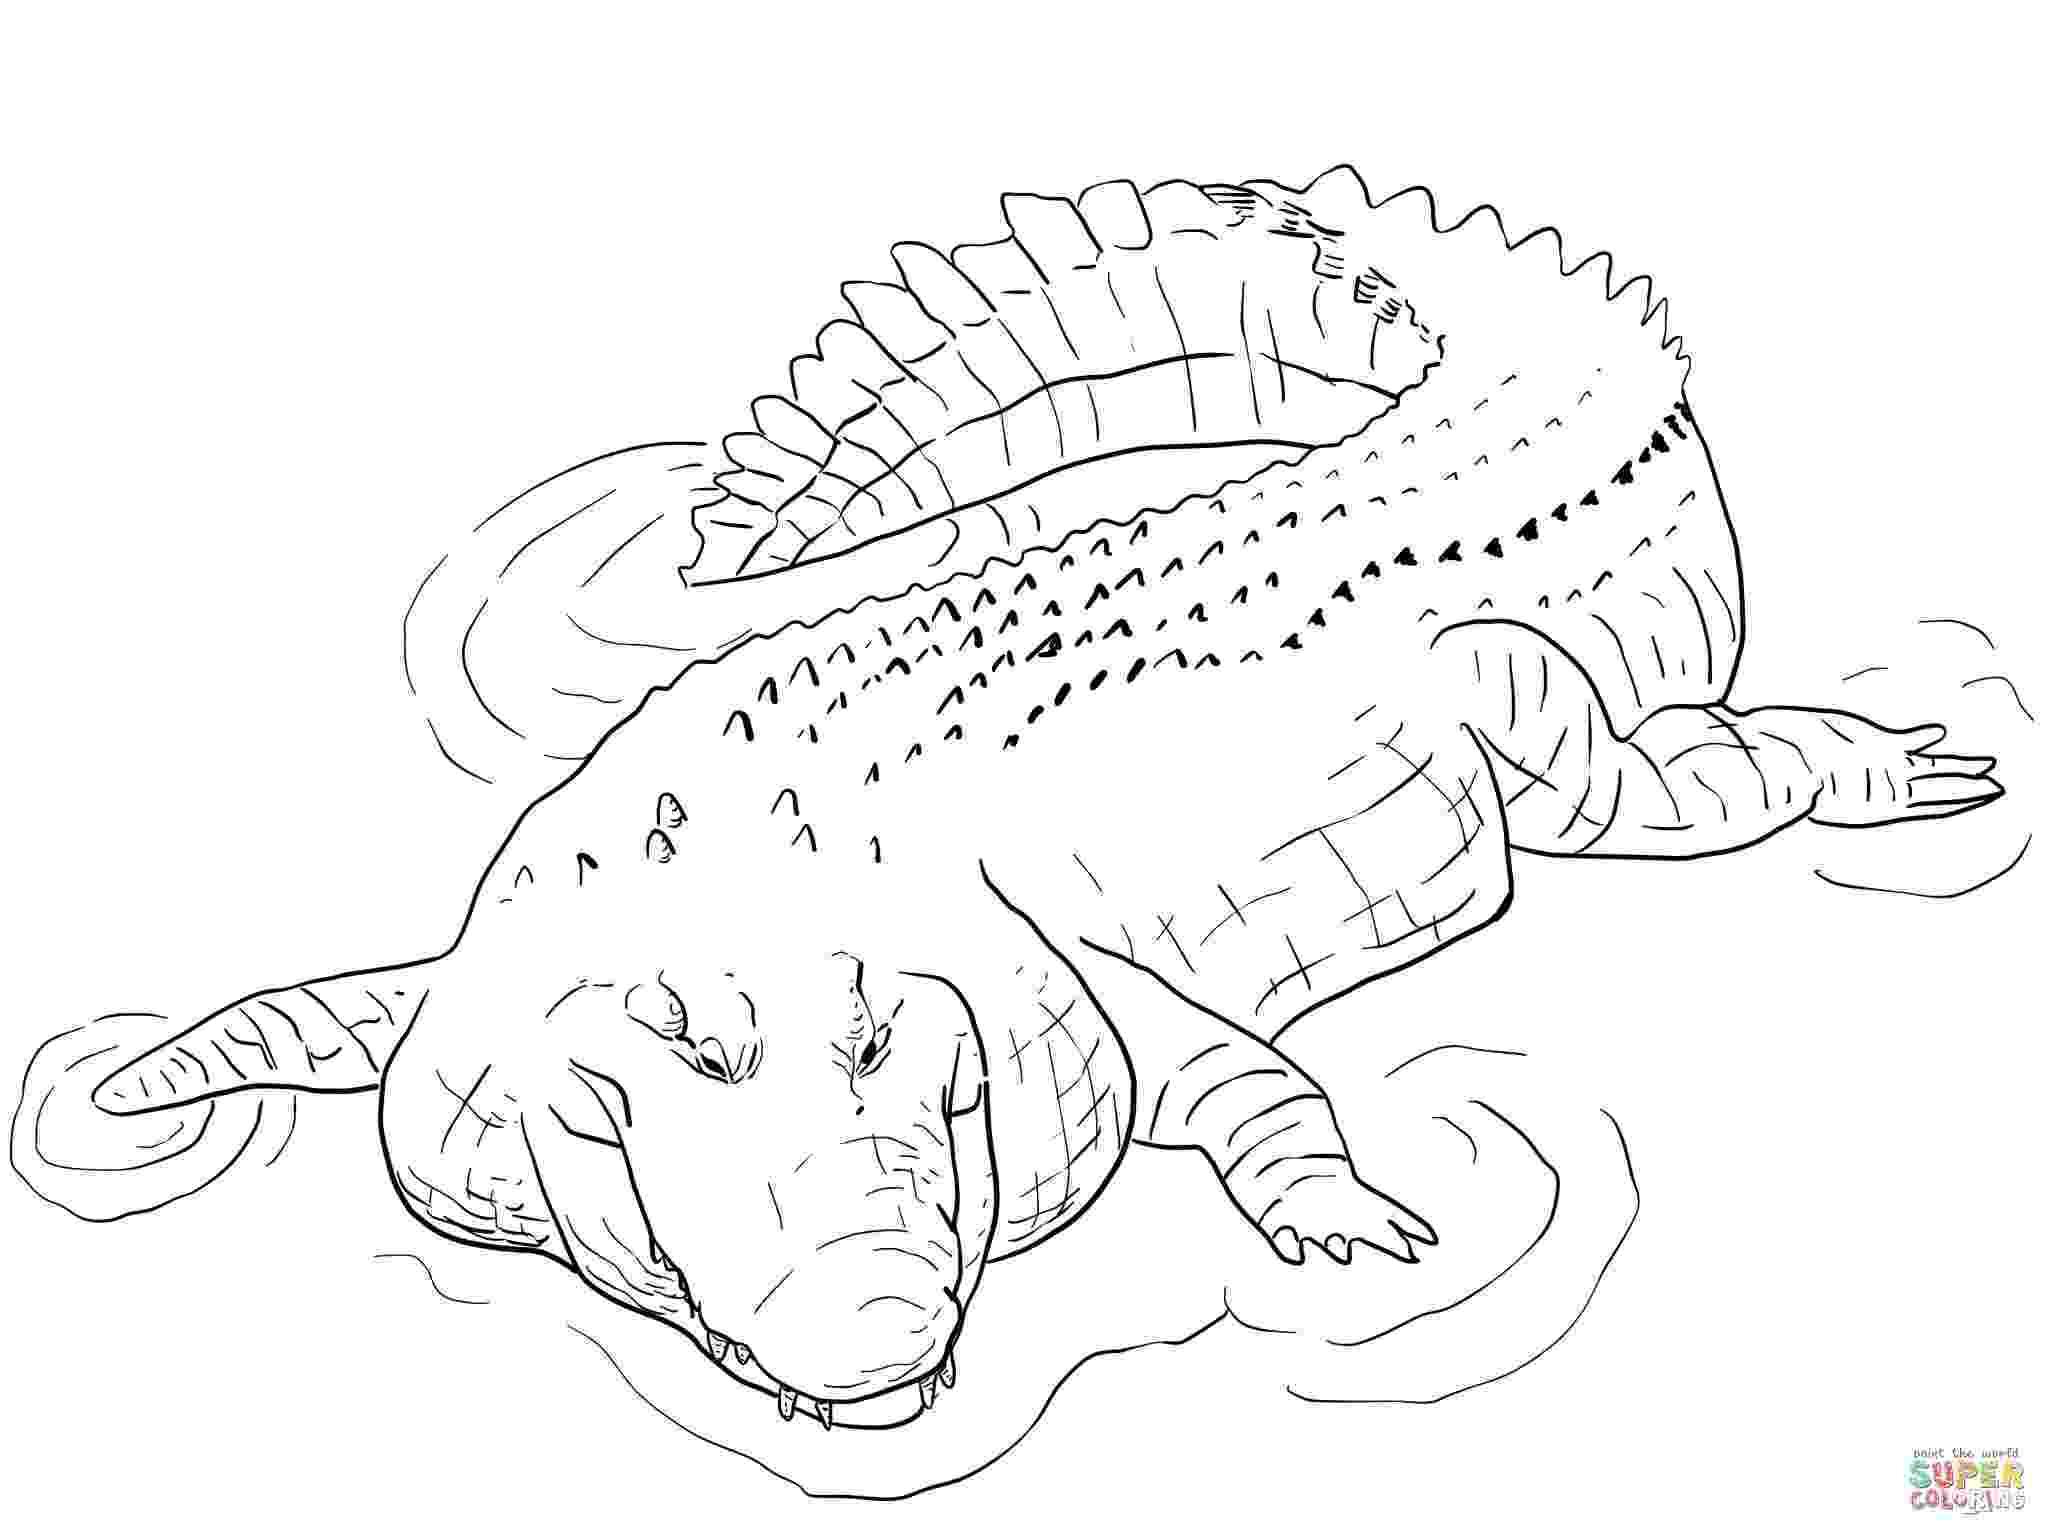 crocodile colouring page free printable crocodile coloring pages for kids crocodile page colouring